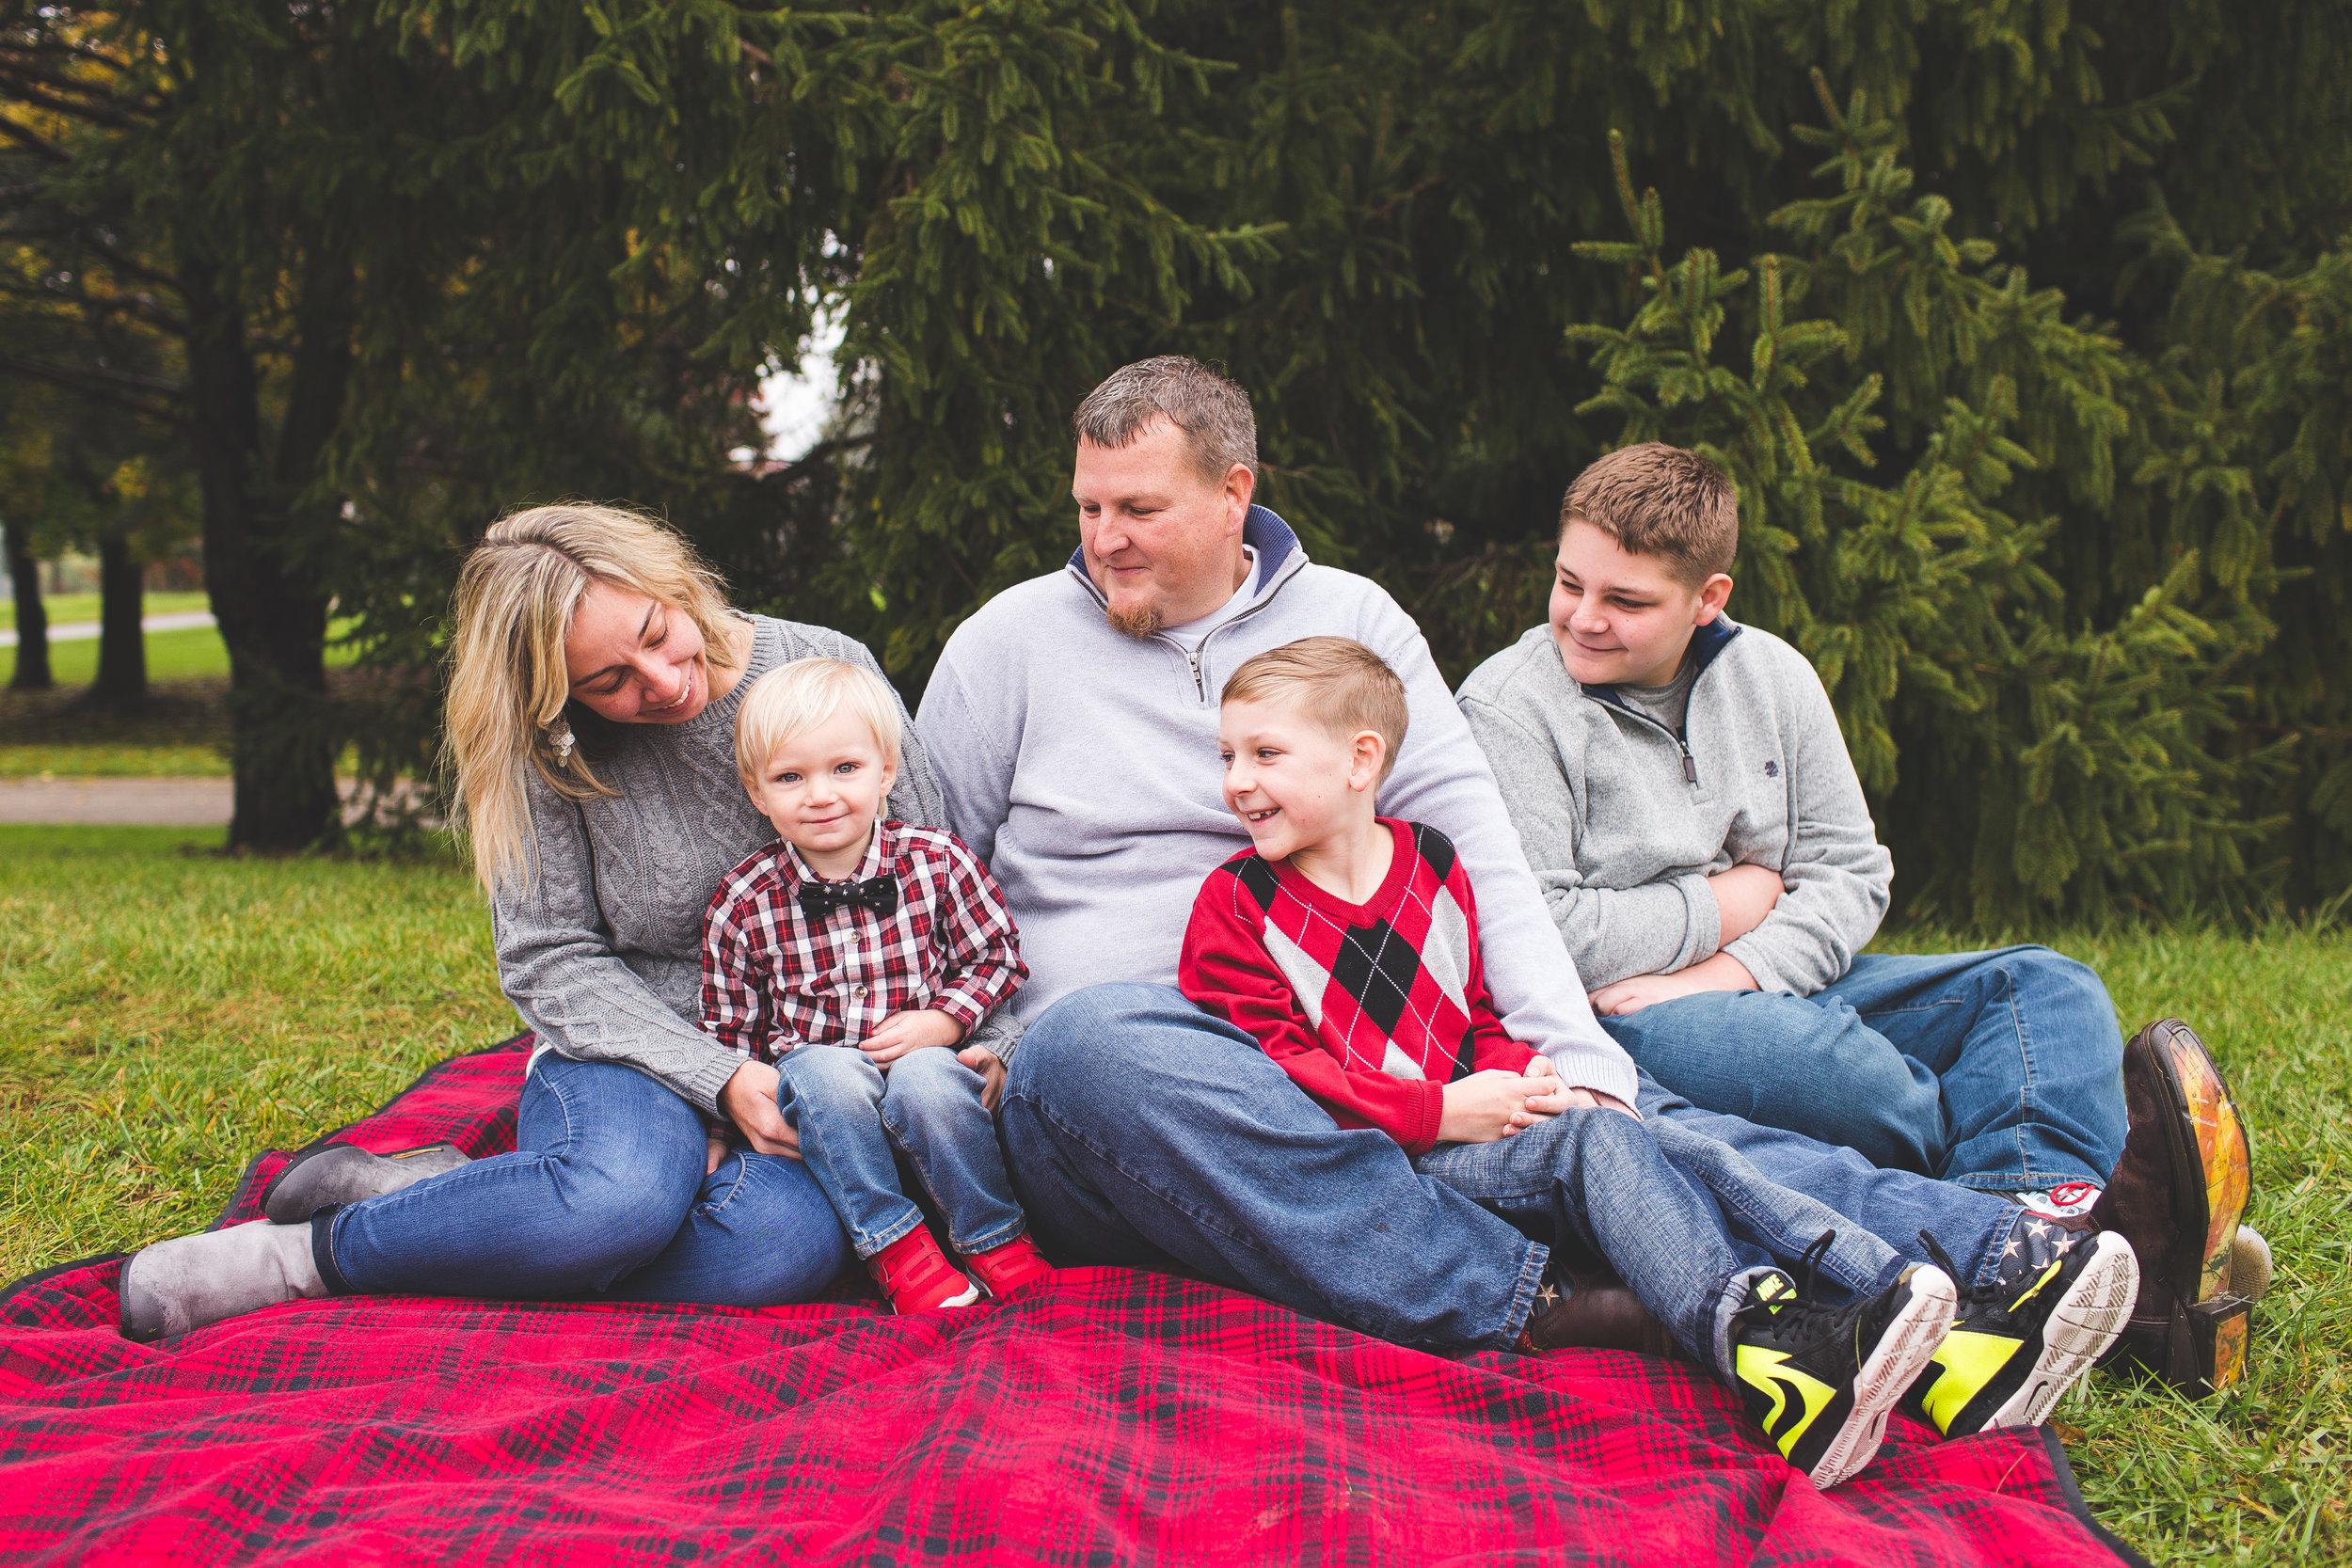 Family Lifestyle Mini Session Hilliard Ohio